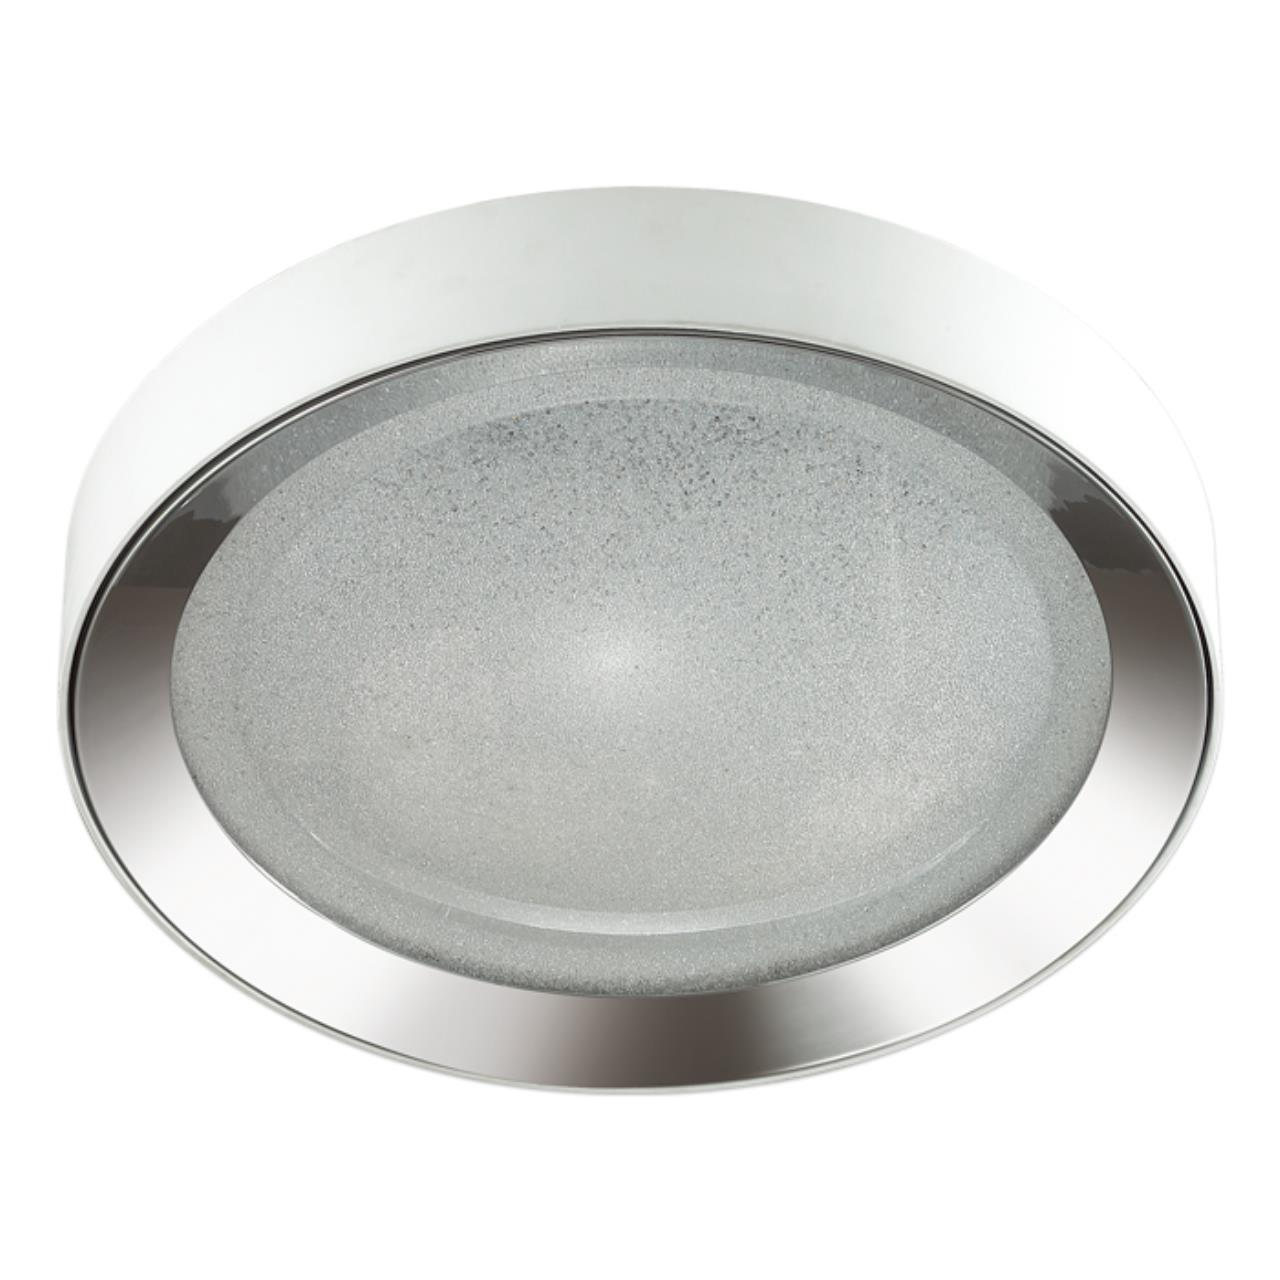 4018/57CL L-VISION ODL18 63 бел/хром/прозрачн Люстра потолочная IP20 LED 57W 220V TENO